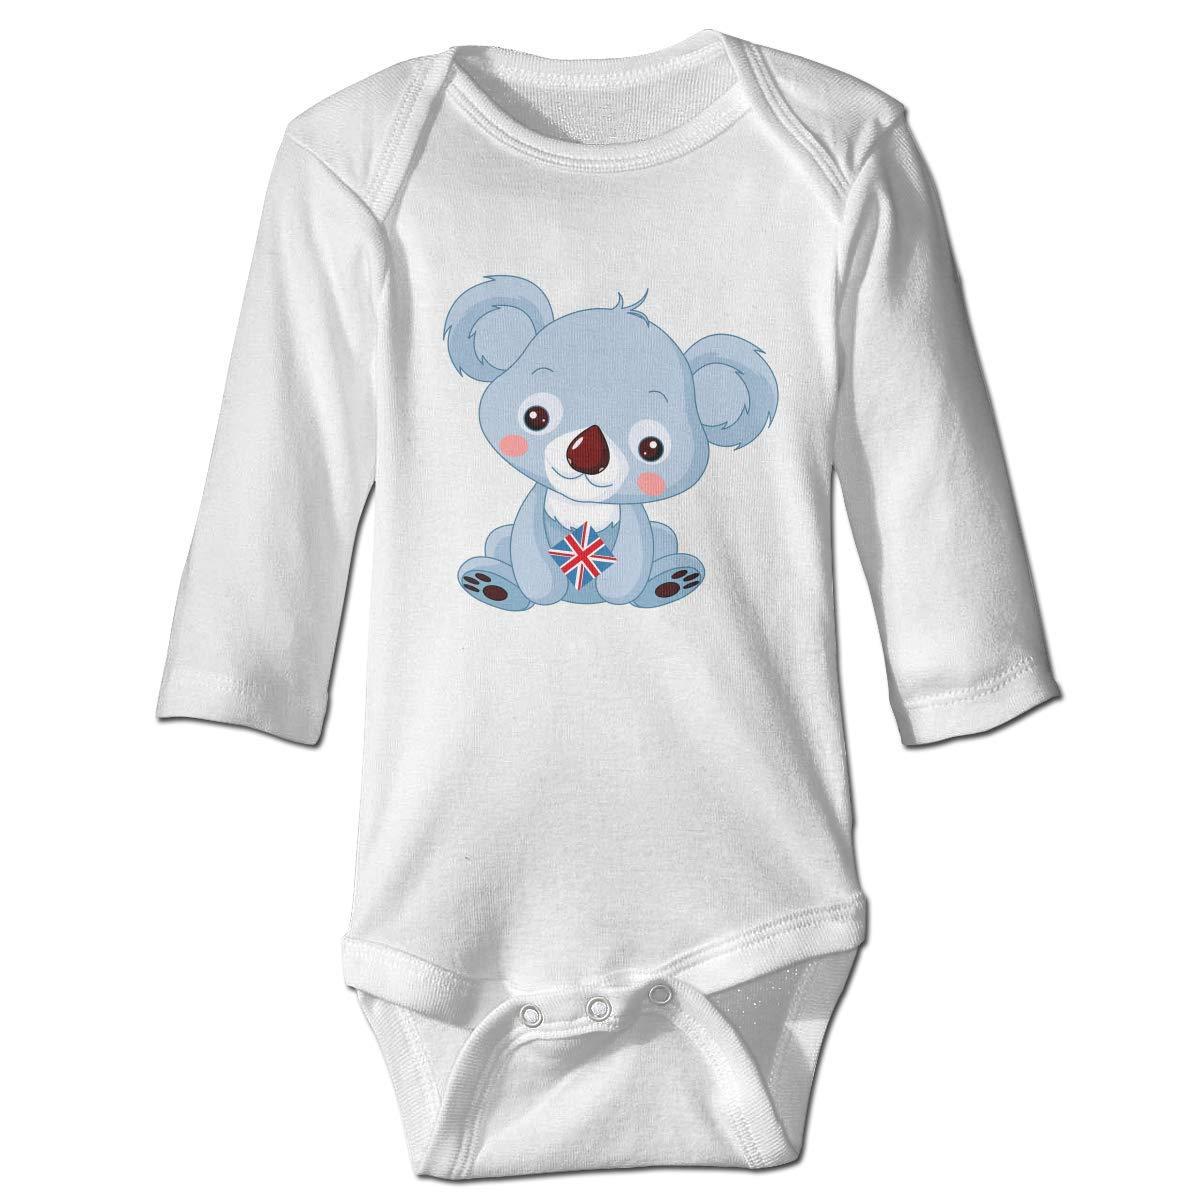 WBinHua Bodysuits Baby Bodysuit Baby Boys Bertha Cute Animal Australia Koala Bear Baby Toddler Long Sleeve Onesies Bodysuits